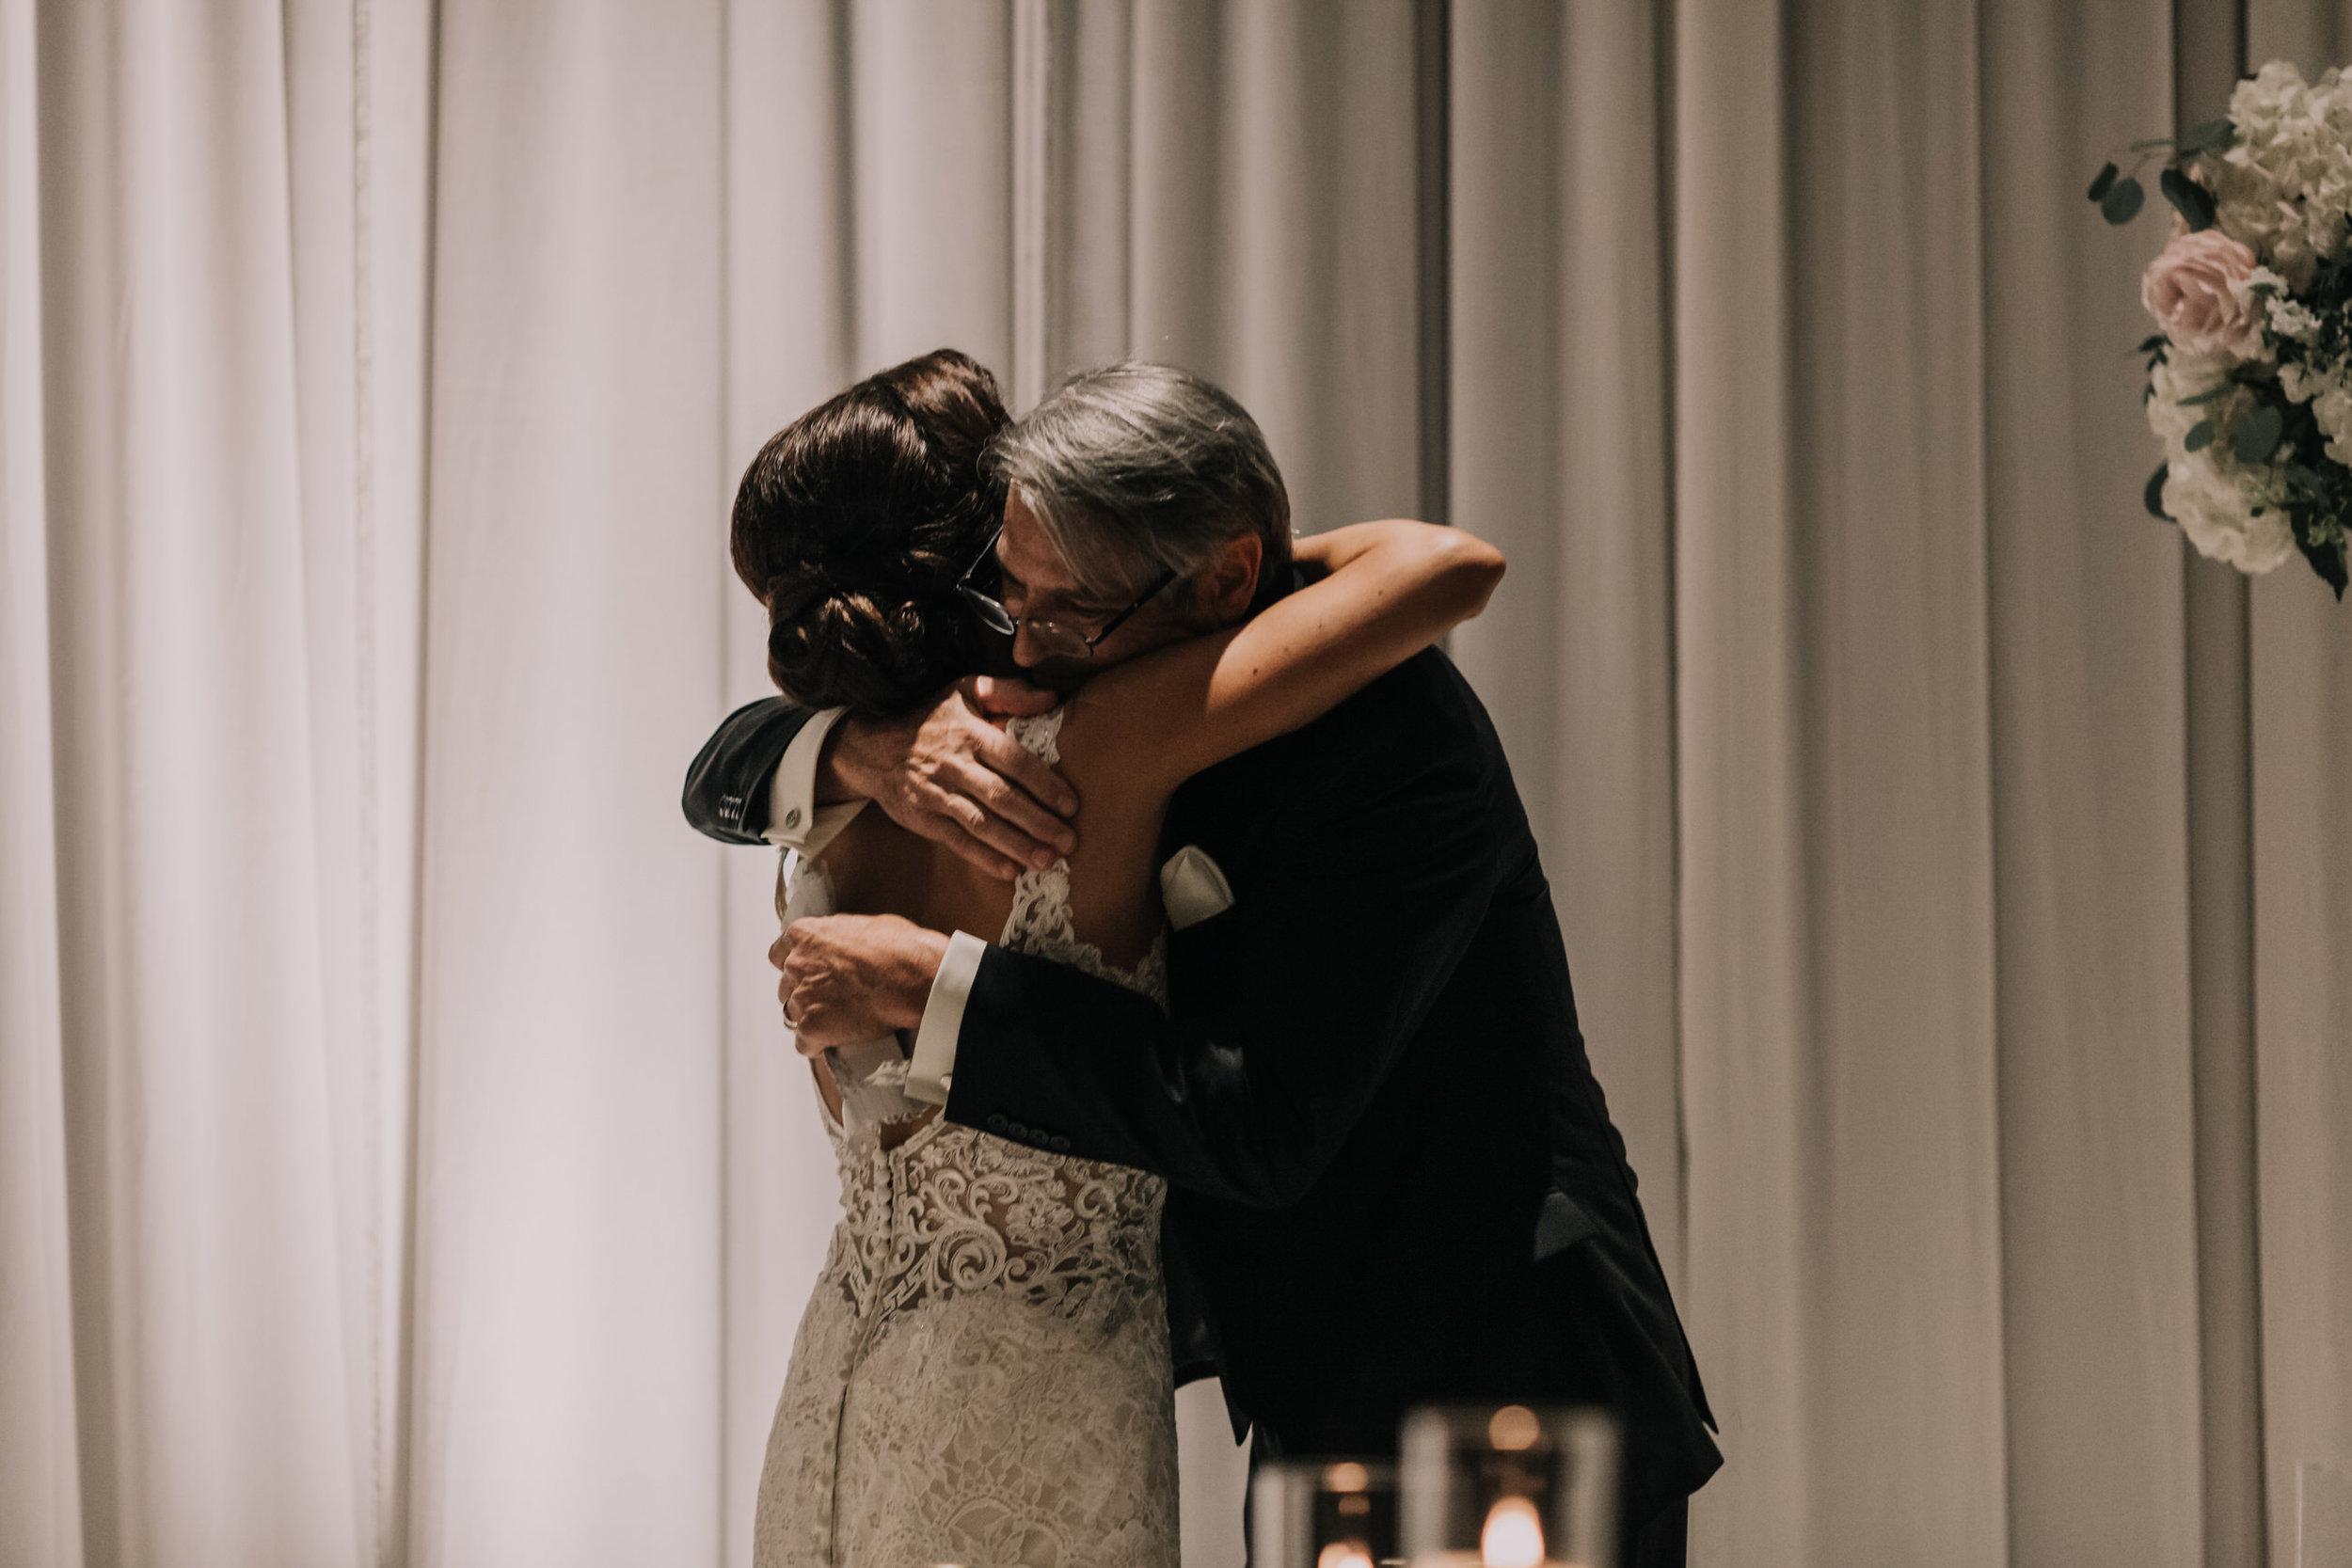 Pitt Meadows Wedding Photographer - Sky Hangar Wedding Photos - Vancouver Wedding Photographer & Videographer - Sunshine Coast Wedding Photos - Sunshine Coast Wedding Photographer - Jennifer Picard Photography - IMG_6463.jpg